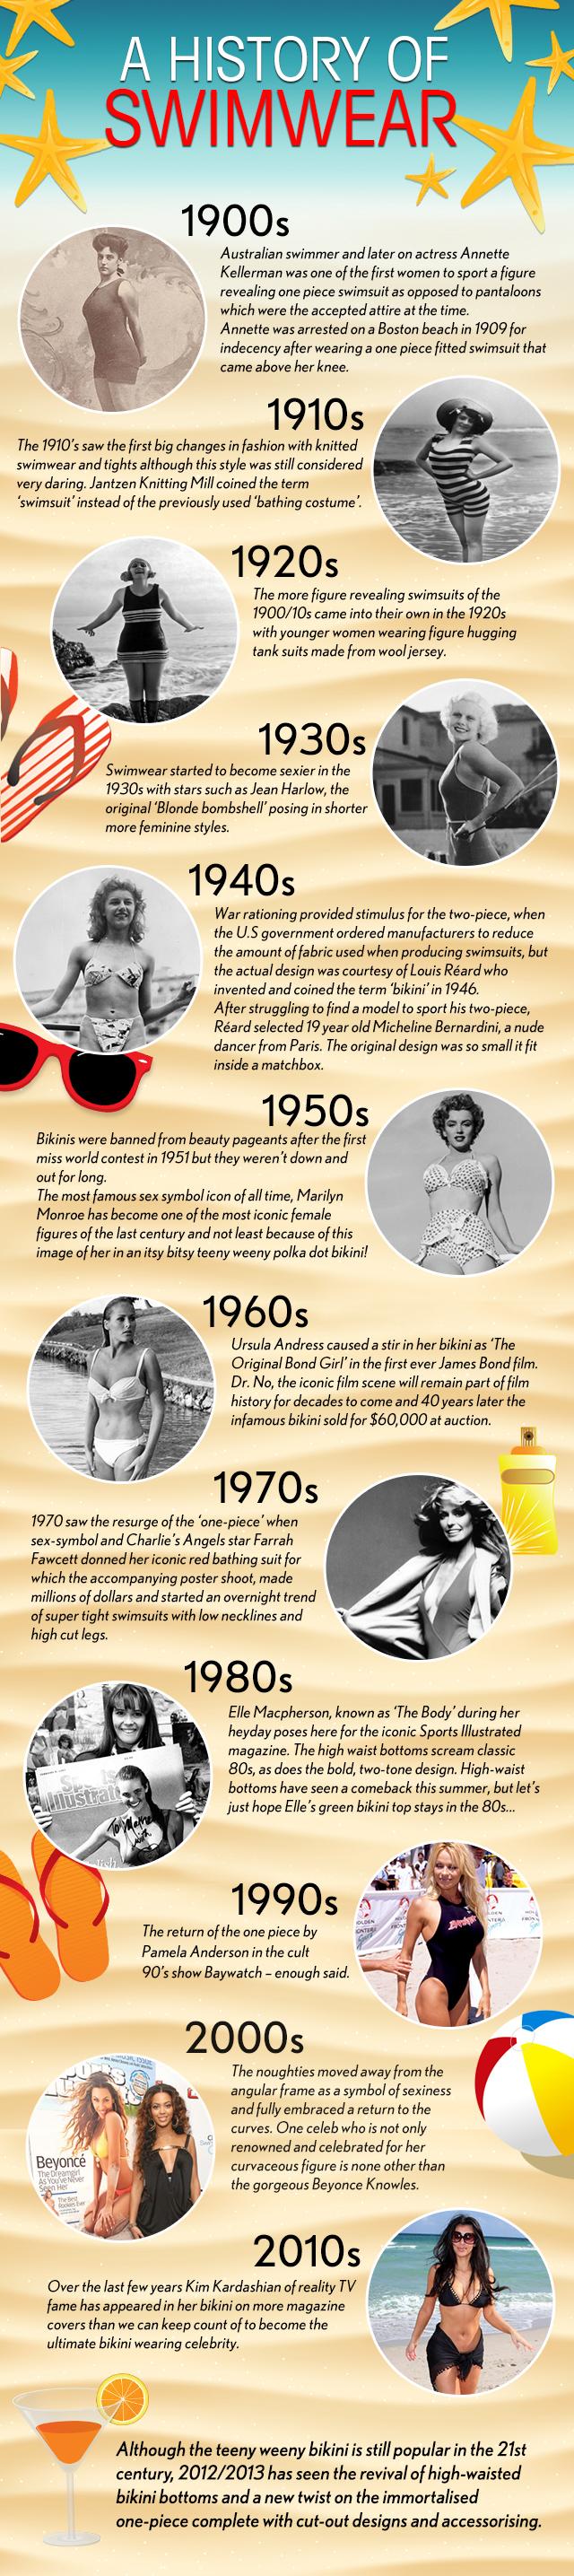 A History of Swimwear